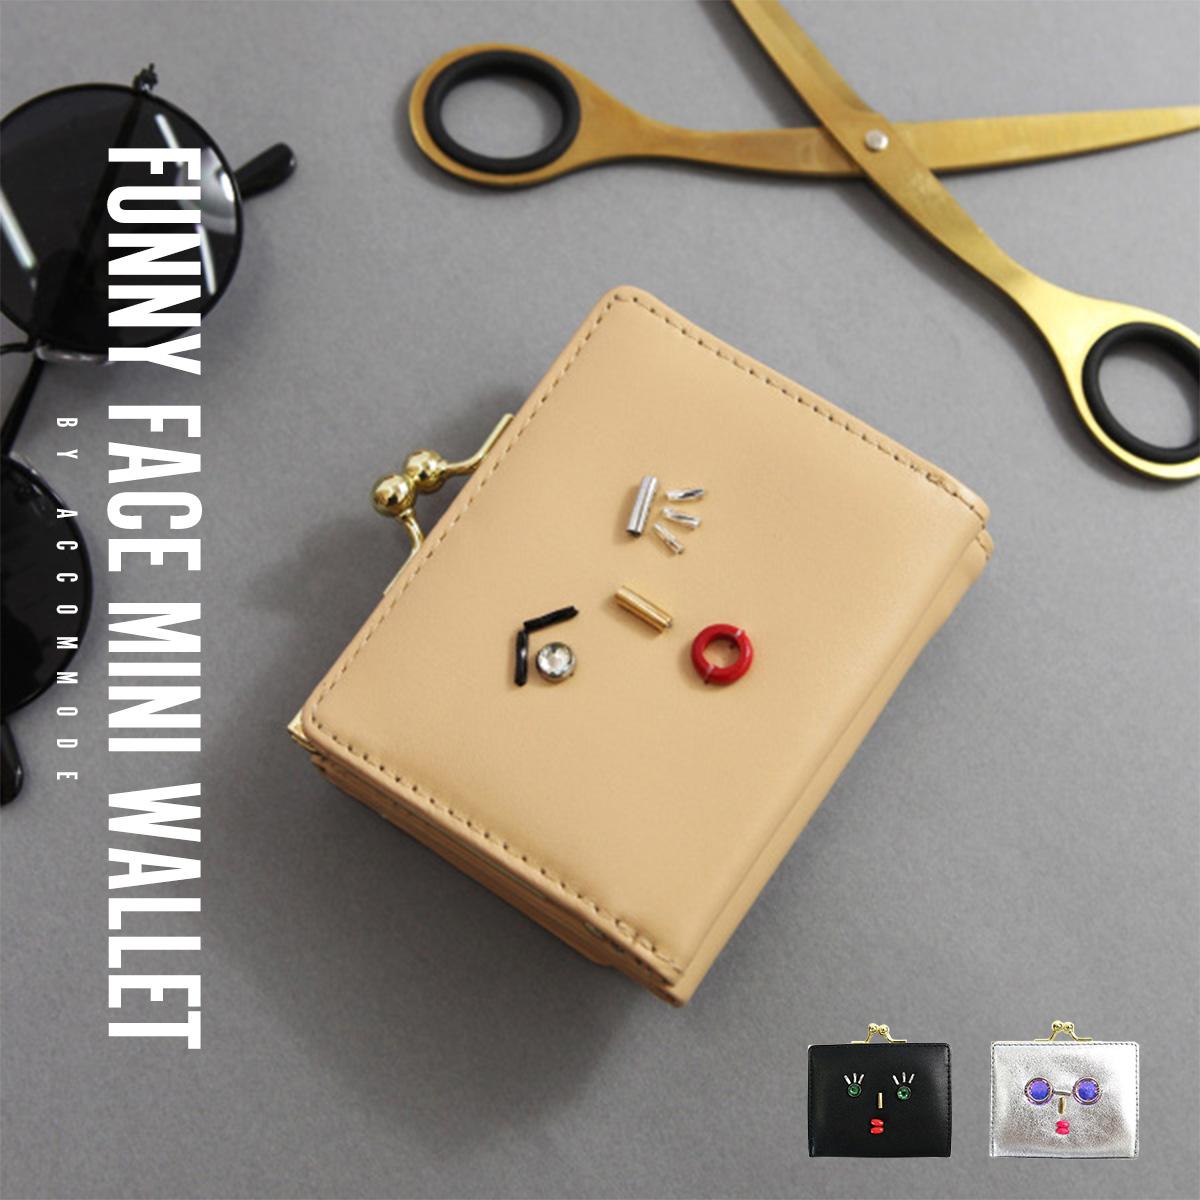 c1e11bfc6e26 accommode ウォレット 財布 がま口 口金付き 小銭入れ 三つ折り 財布 ...